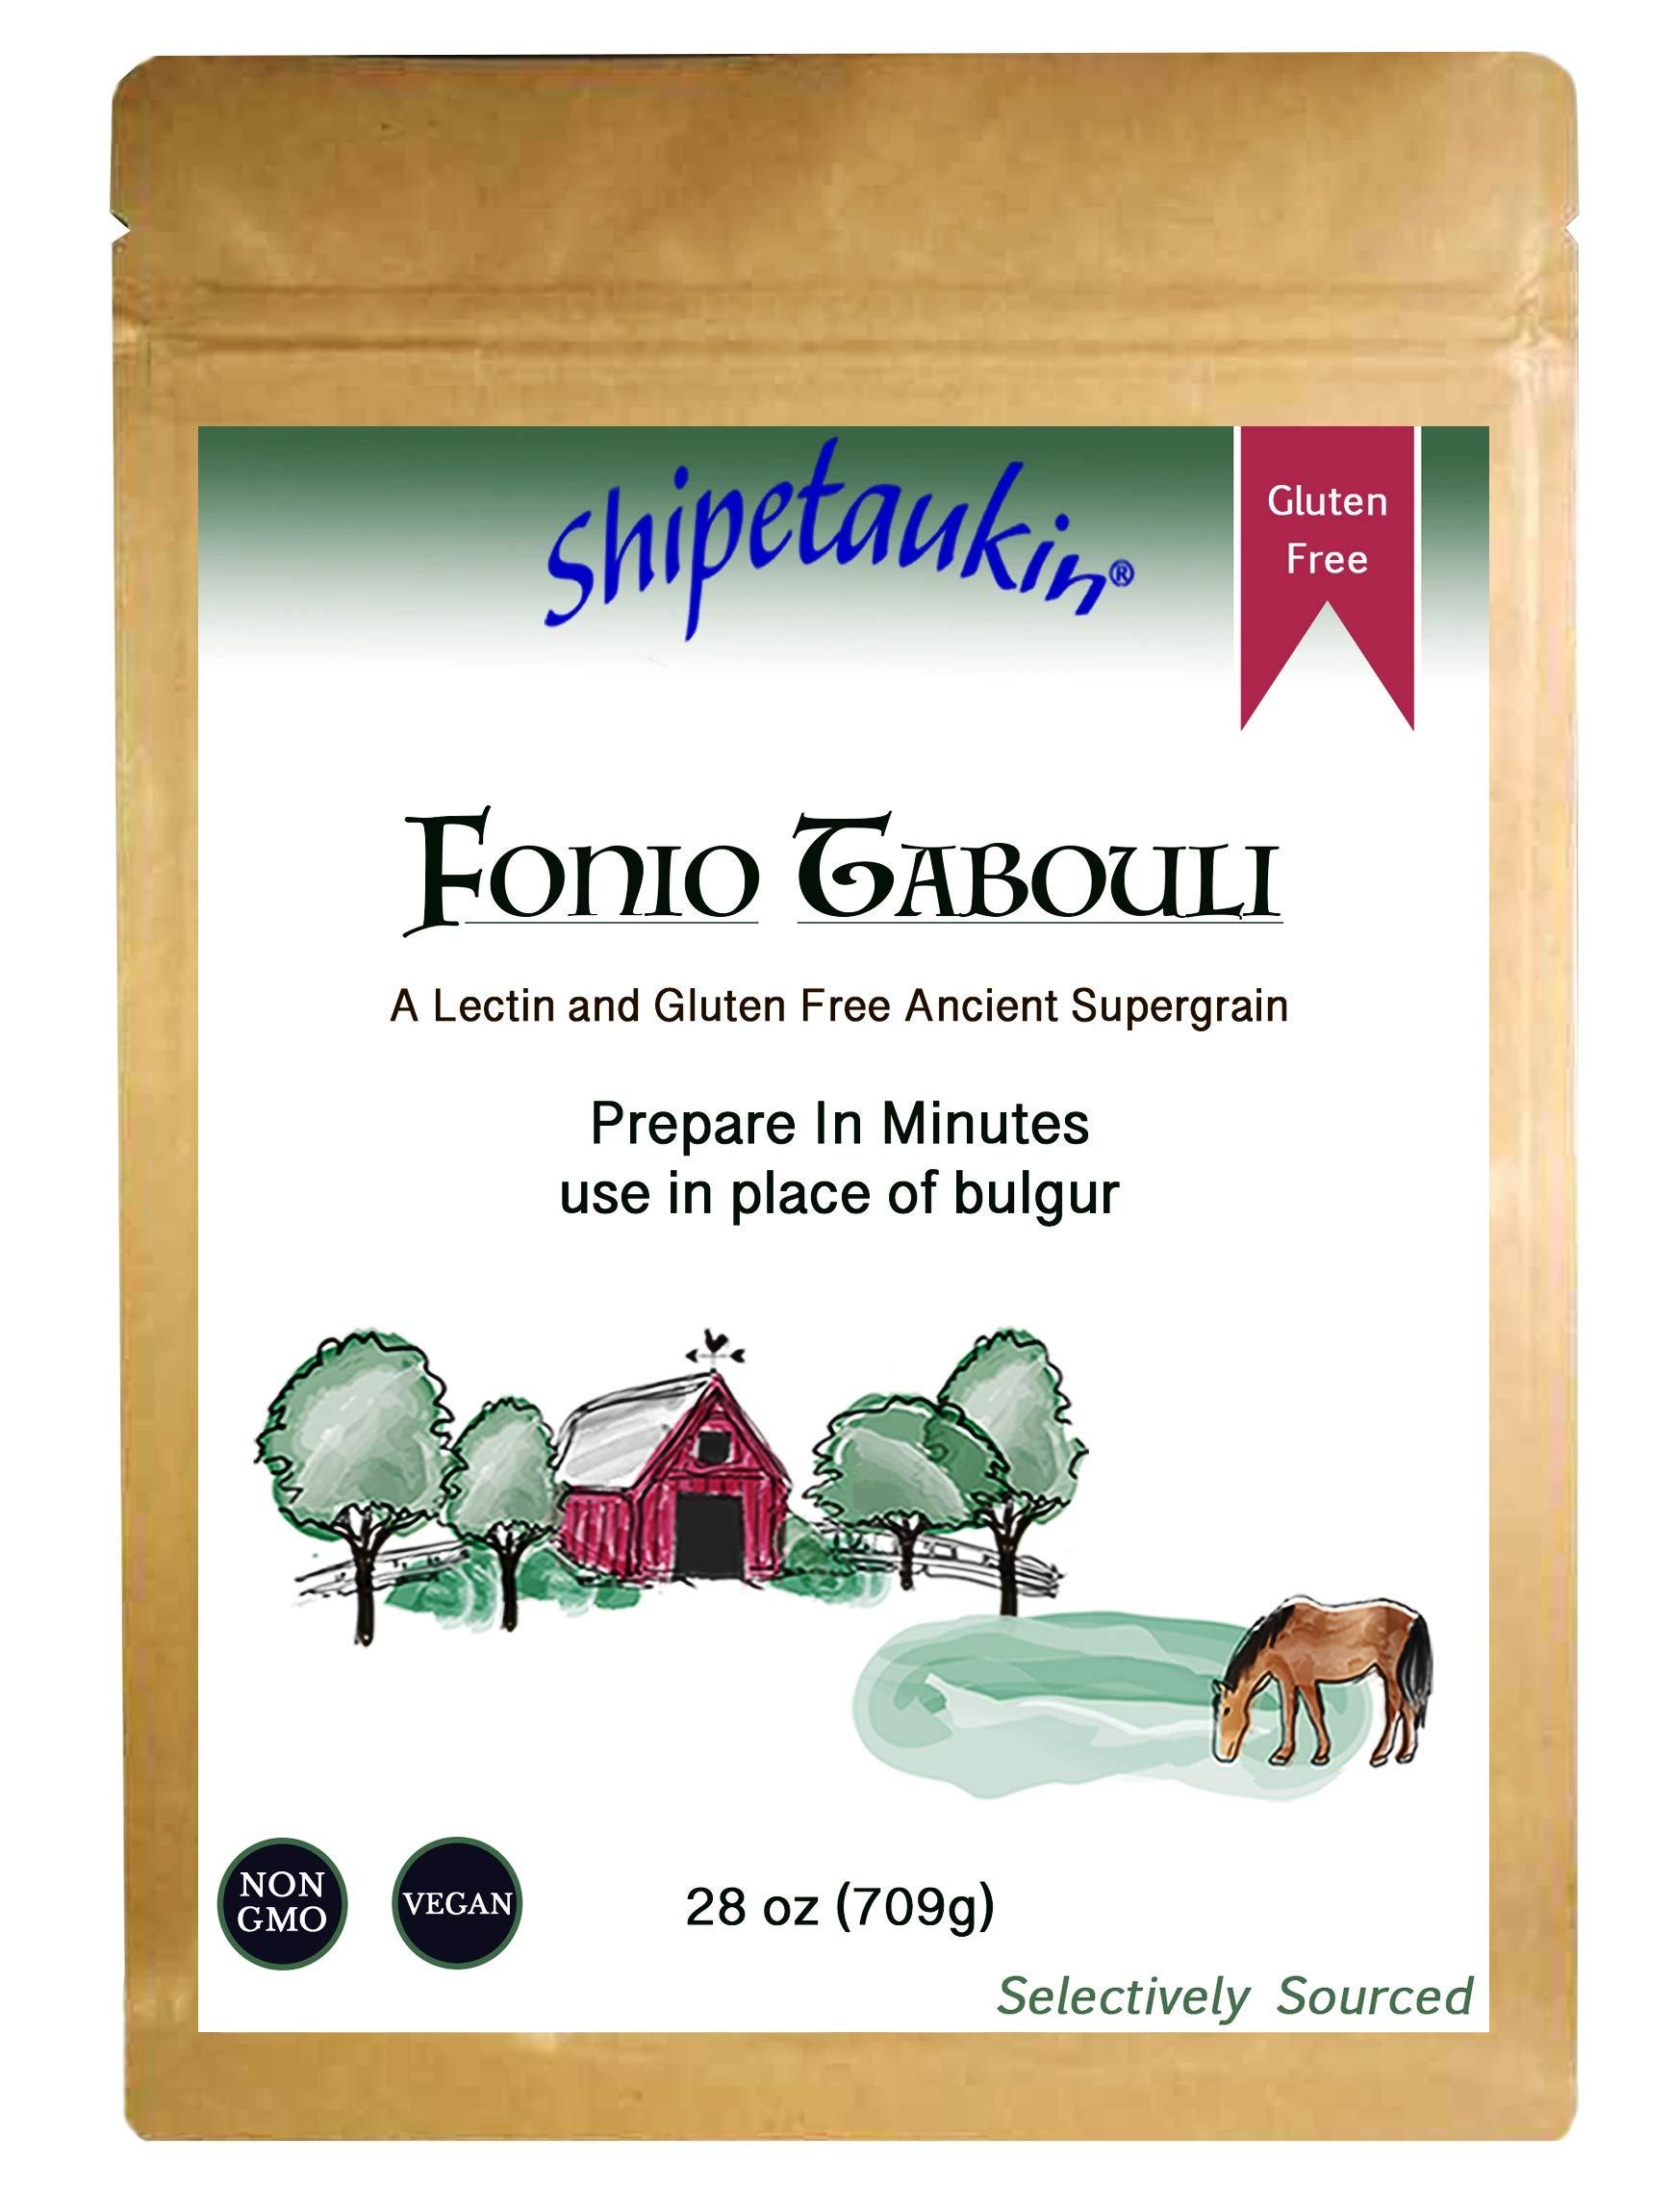 Shipetaukin Vegan Fonio Tabbouleh: a Gluten Free, Lectin Free Ancient African Whole Grain Supergrain, 28 Ounces by Shipetaukin